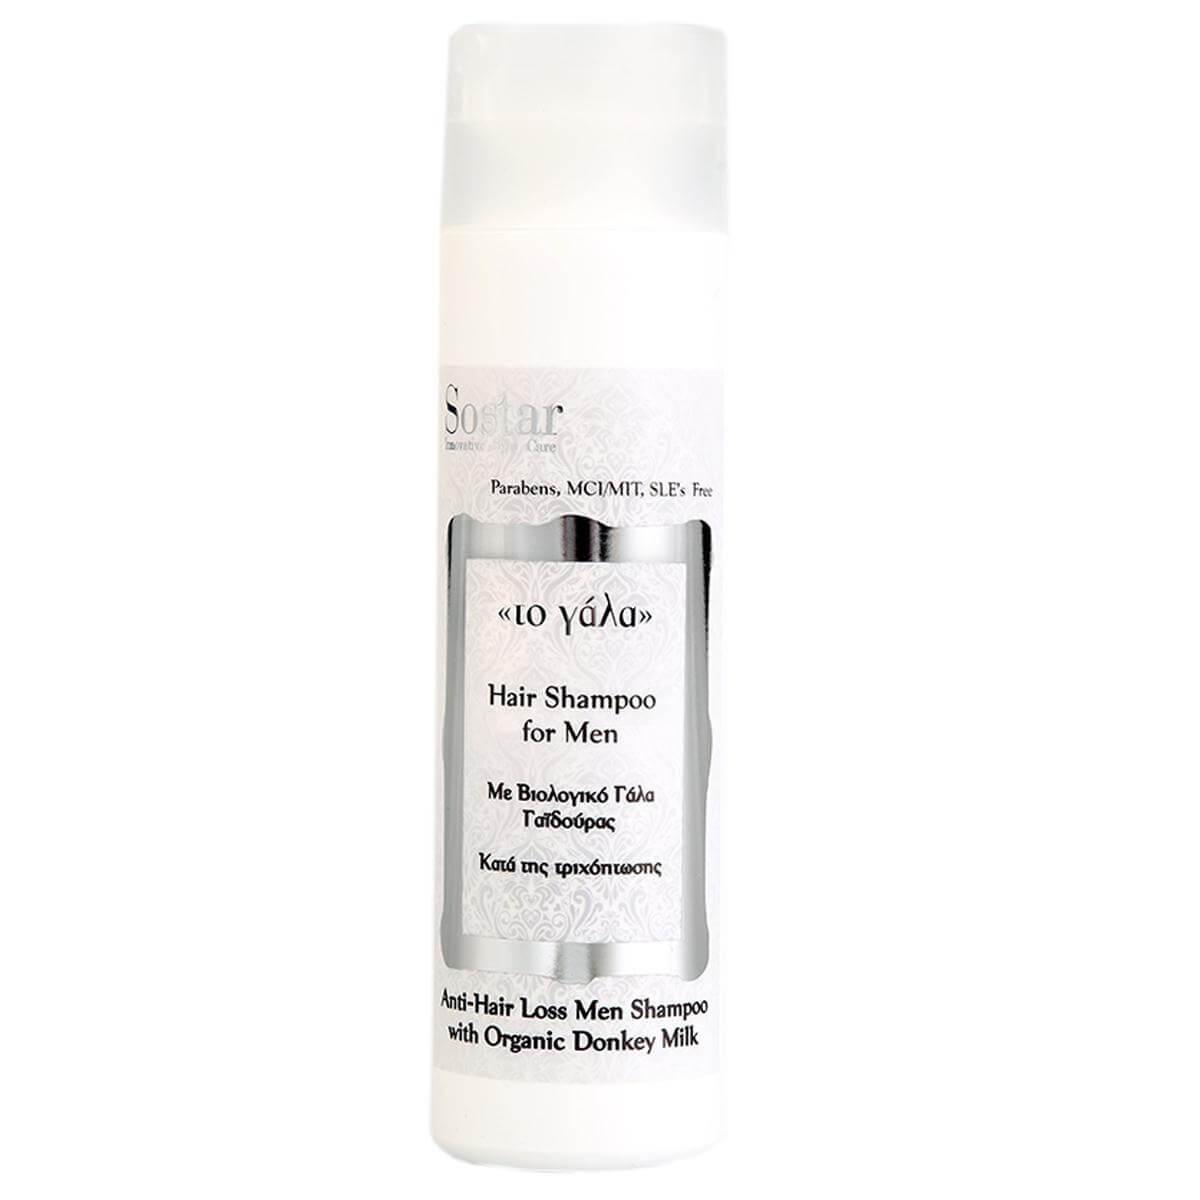 Sostar Το Γάλα Hair Sampoo for Men Ανδρικό Σαμπουάν Κατά της Τριχόπτωσης Με Βιολογικό Γάλα Γαϊδούρας 250ml